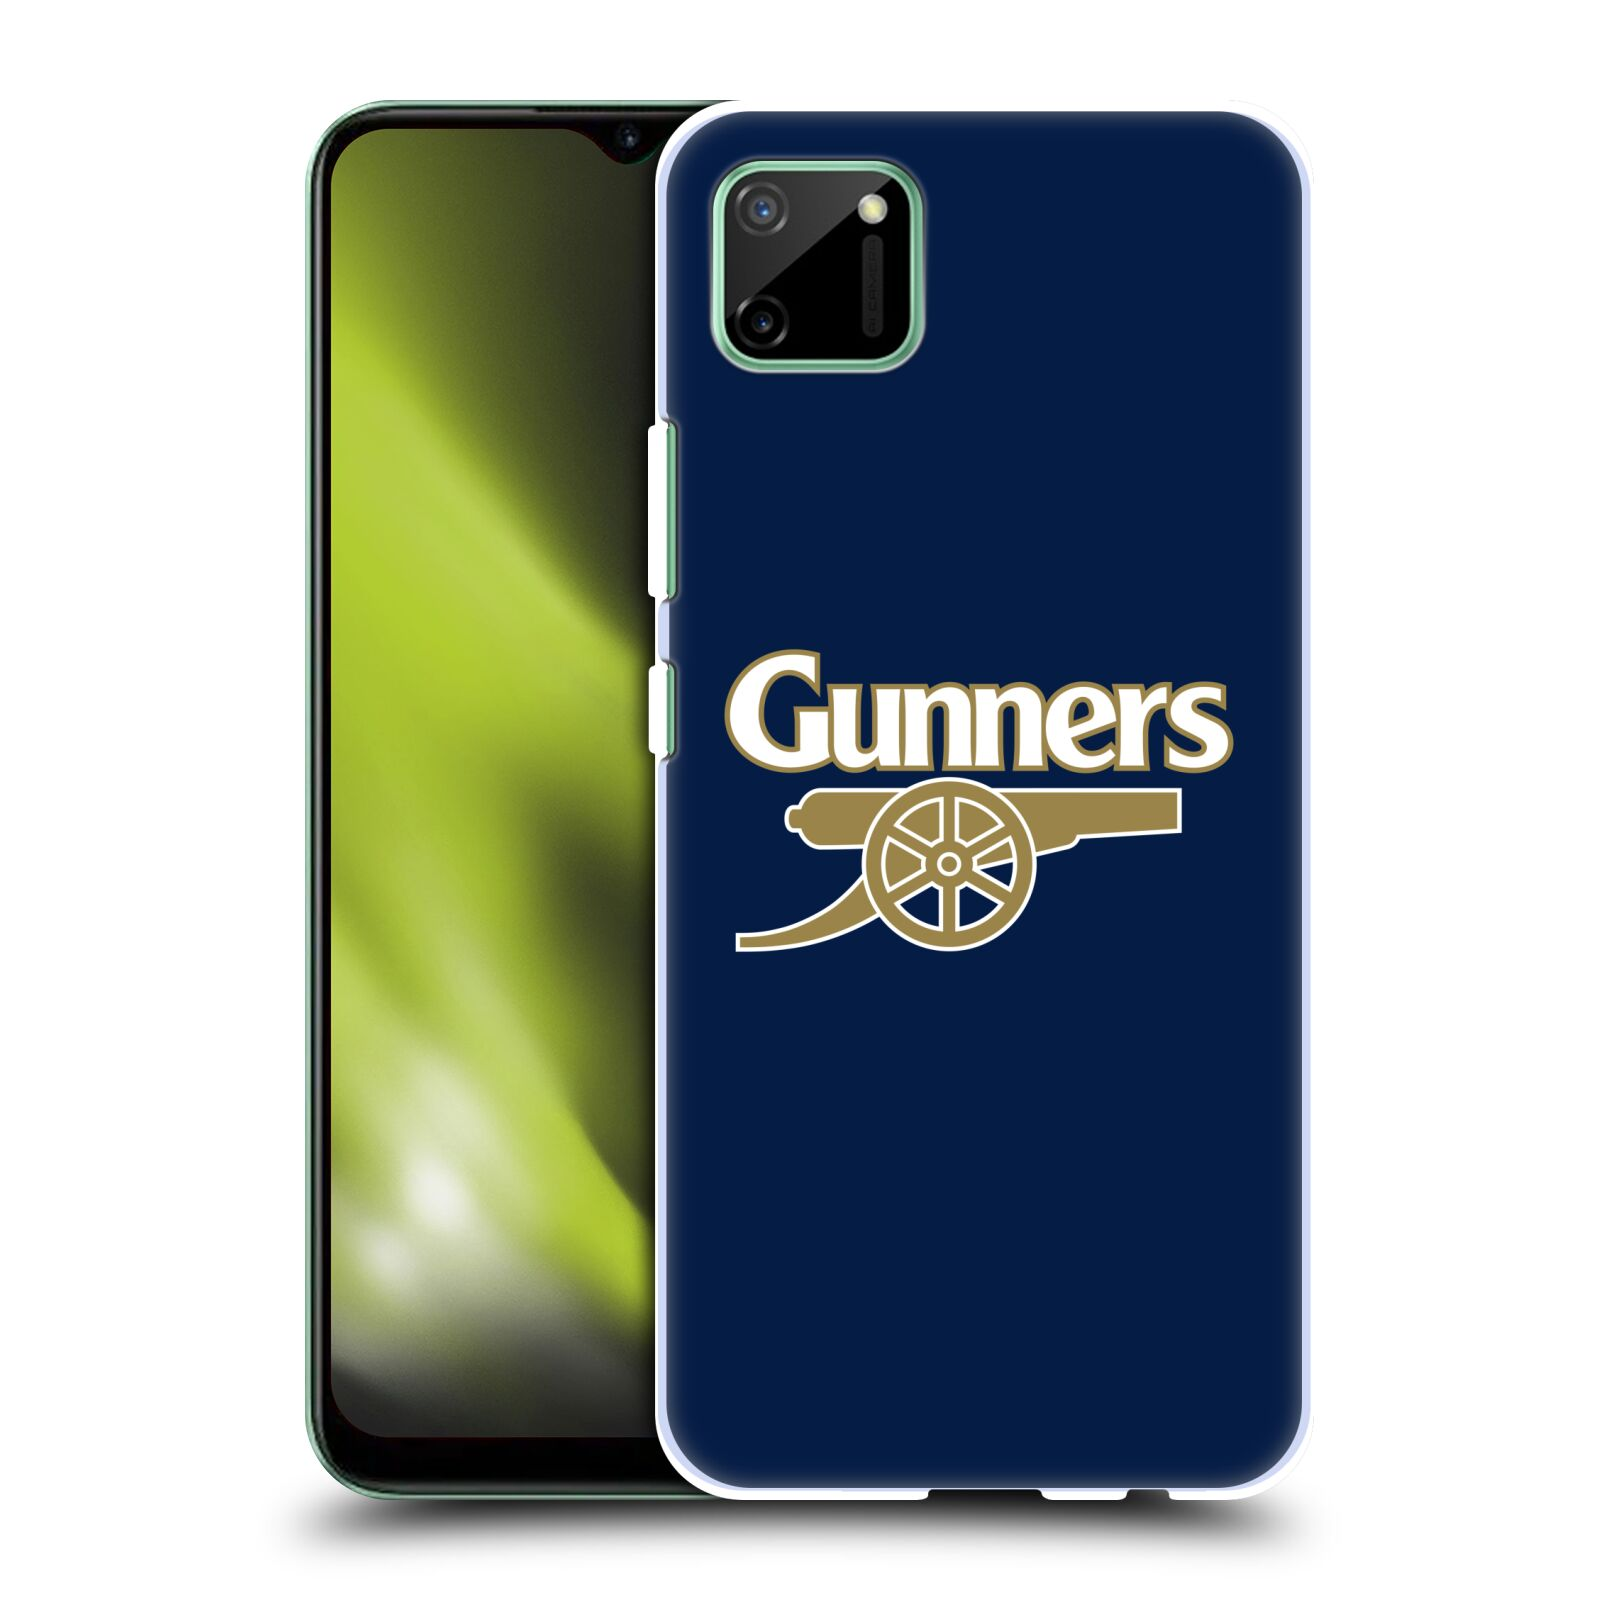 Plastové pouzdro na mobil Realme C11 - Head Case - Arsenal FC - Gunners